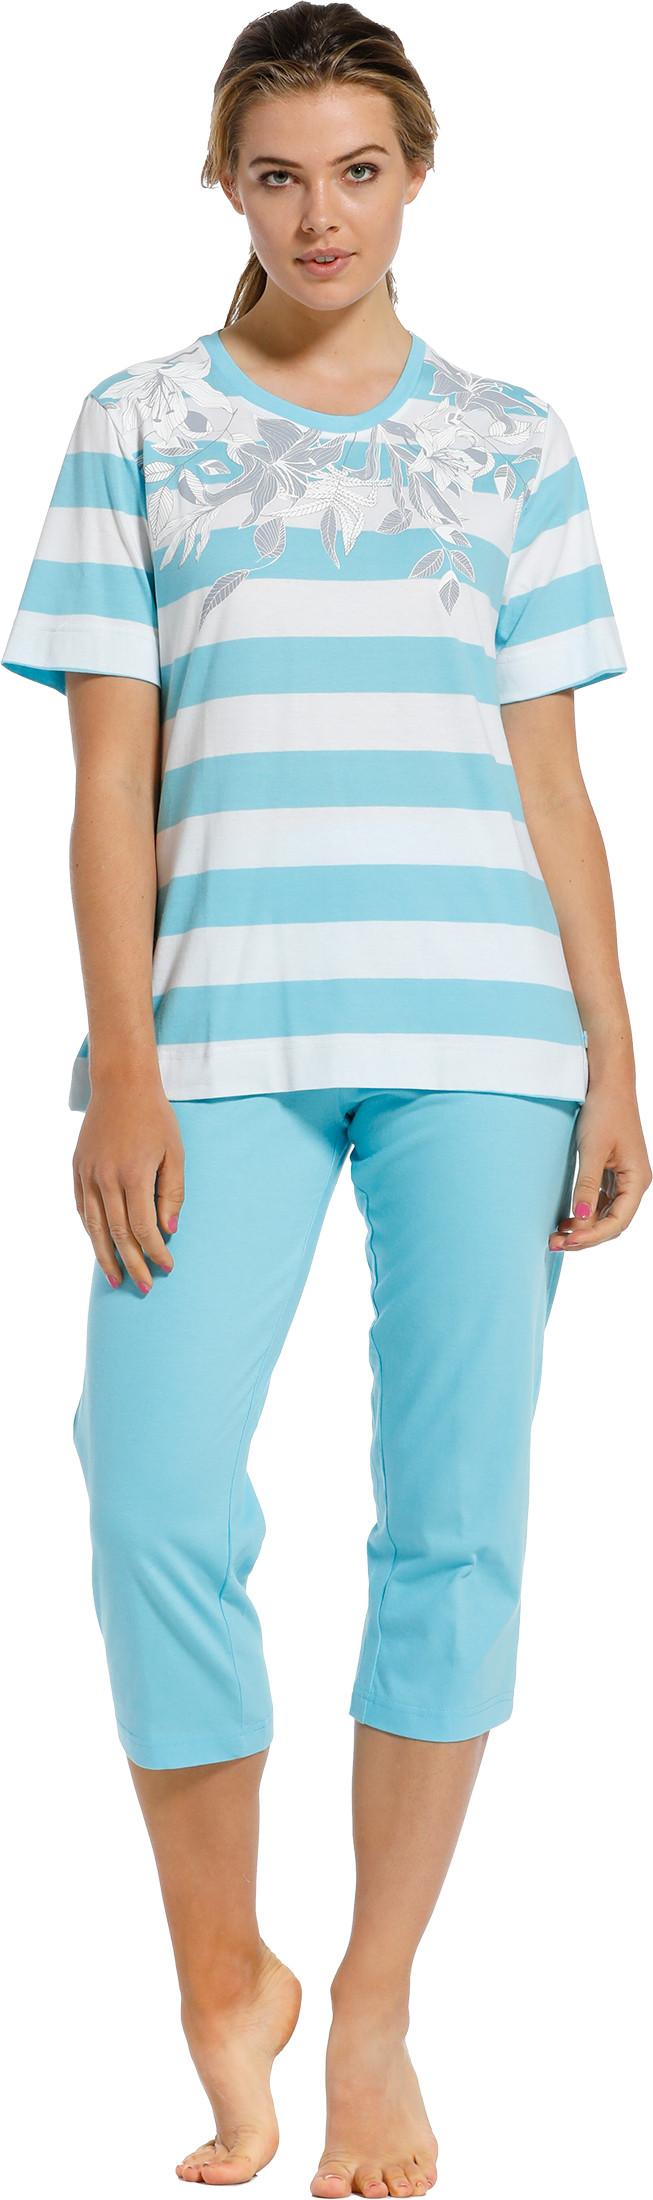 Dames pyjama Pastunette 20211-151-2-42